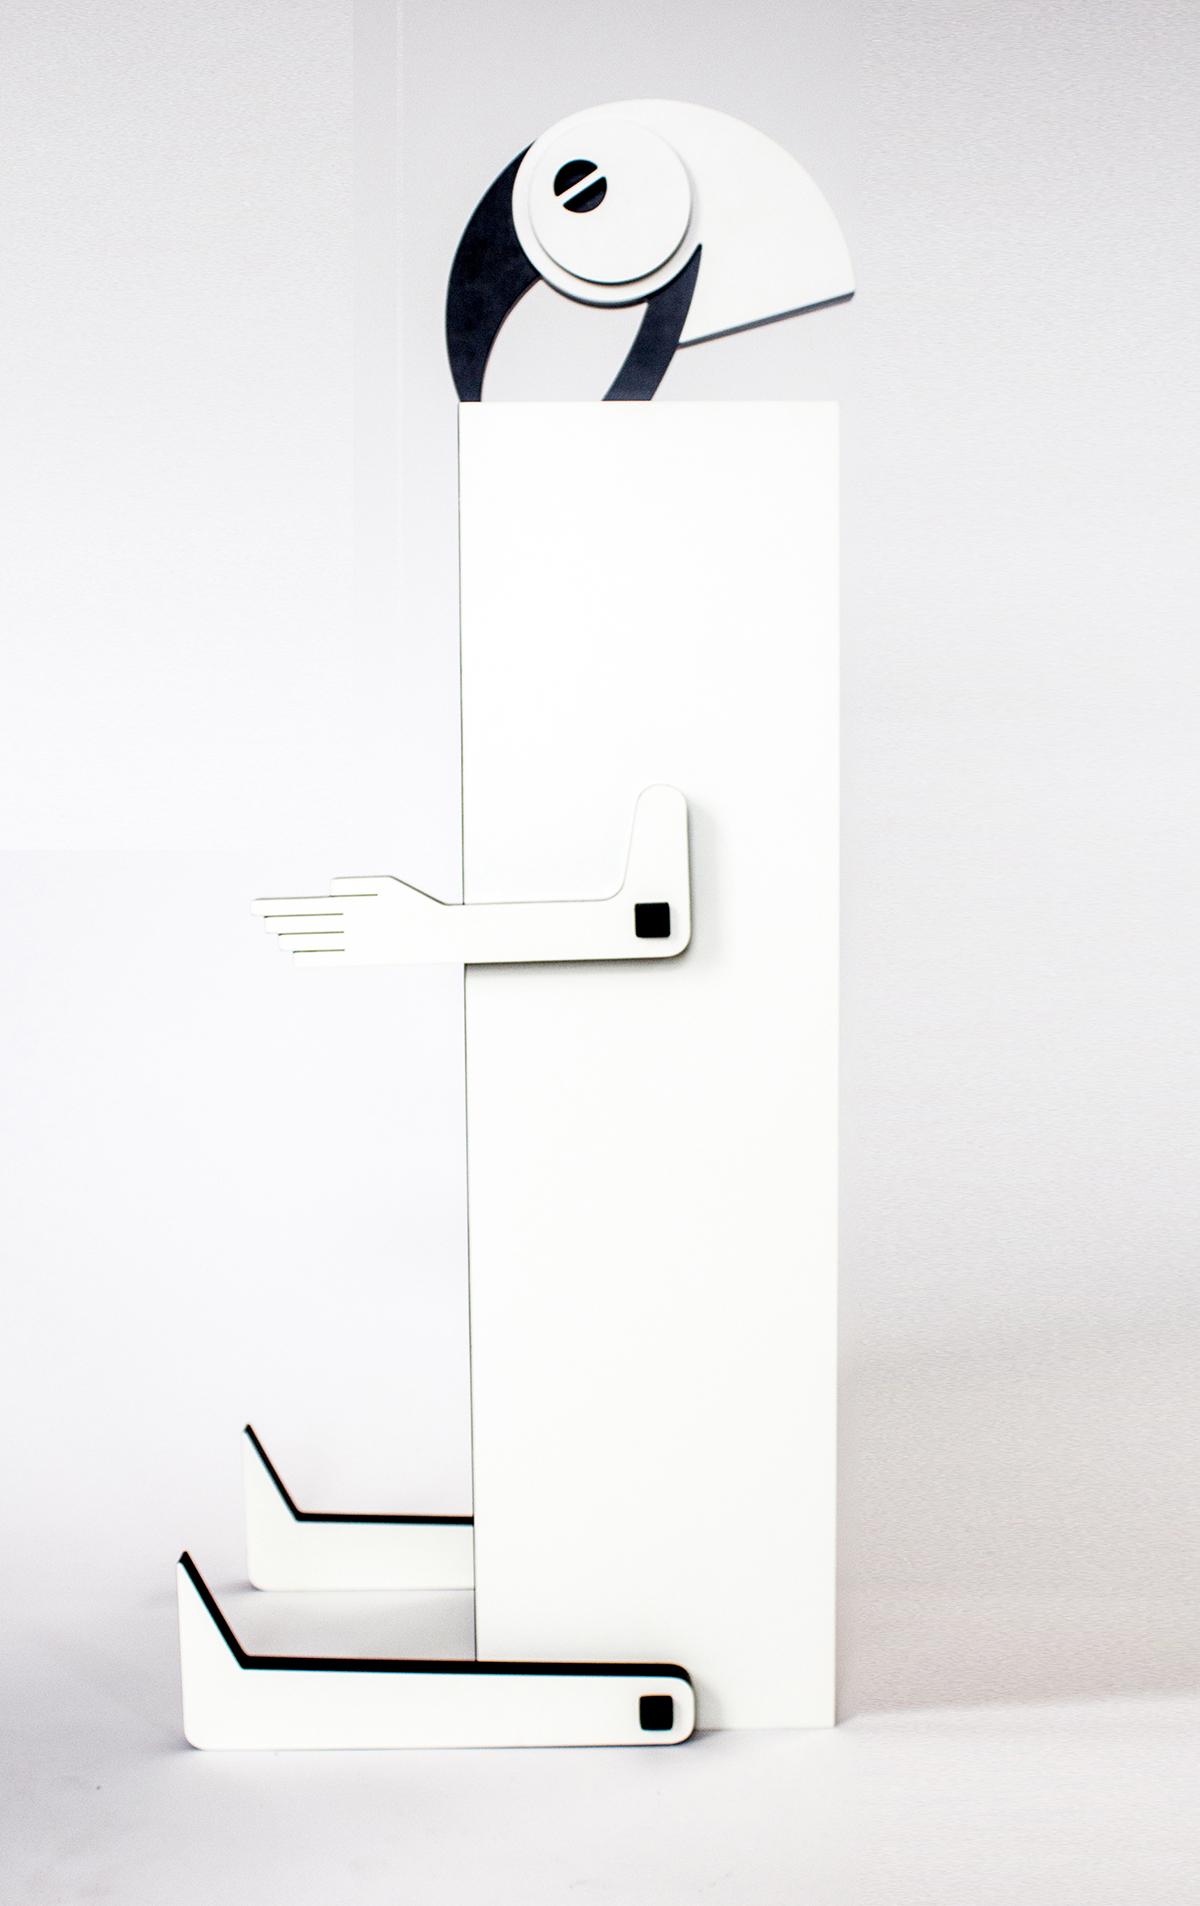 Crawl-chair-Materiallust-New-York-Design-Week-Collective-Childrens-Furniture-21.jpg